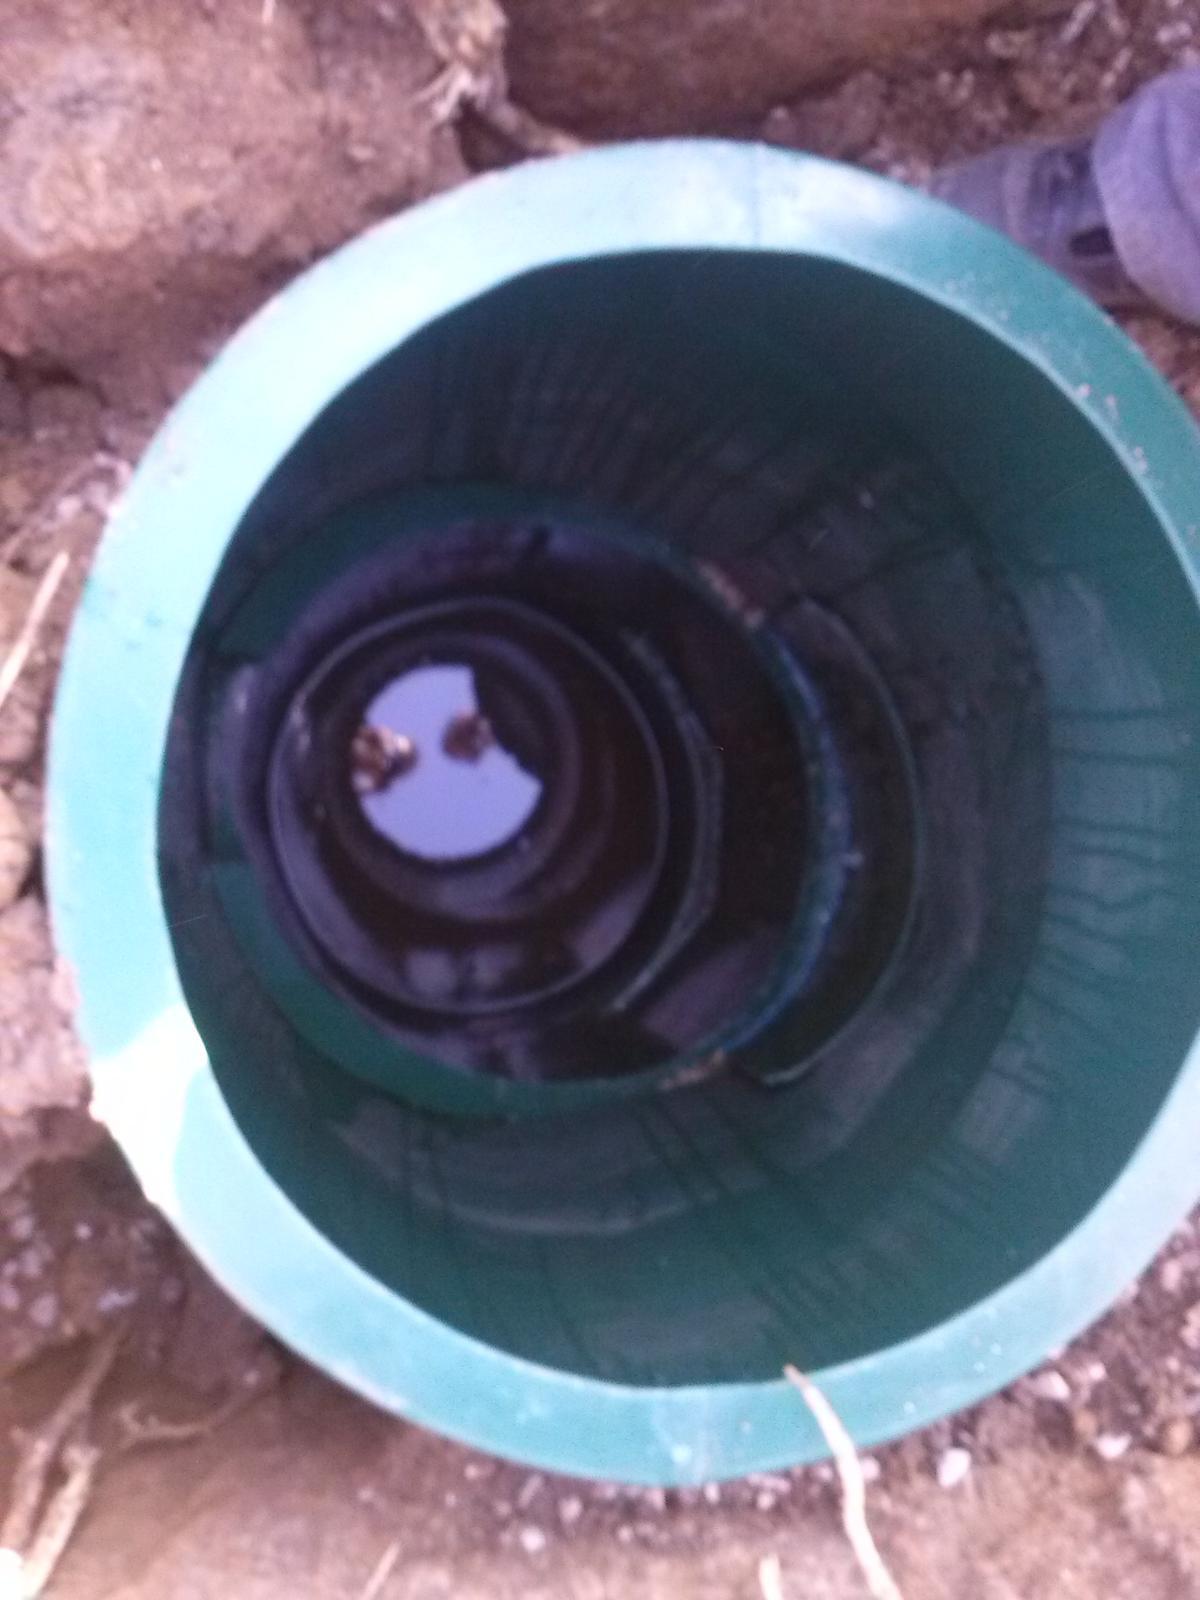 Vitajte u mňa :) - za prvych 12 h. voda v studni kulminovala :D